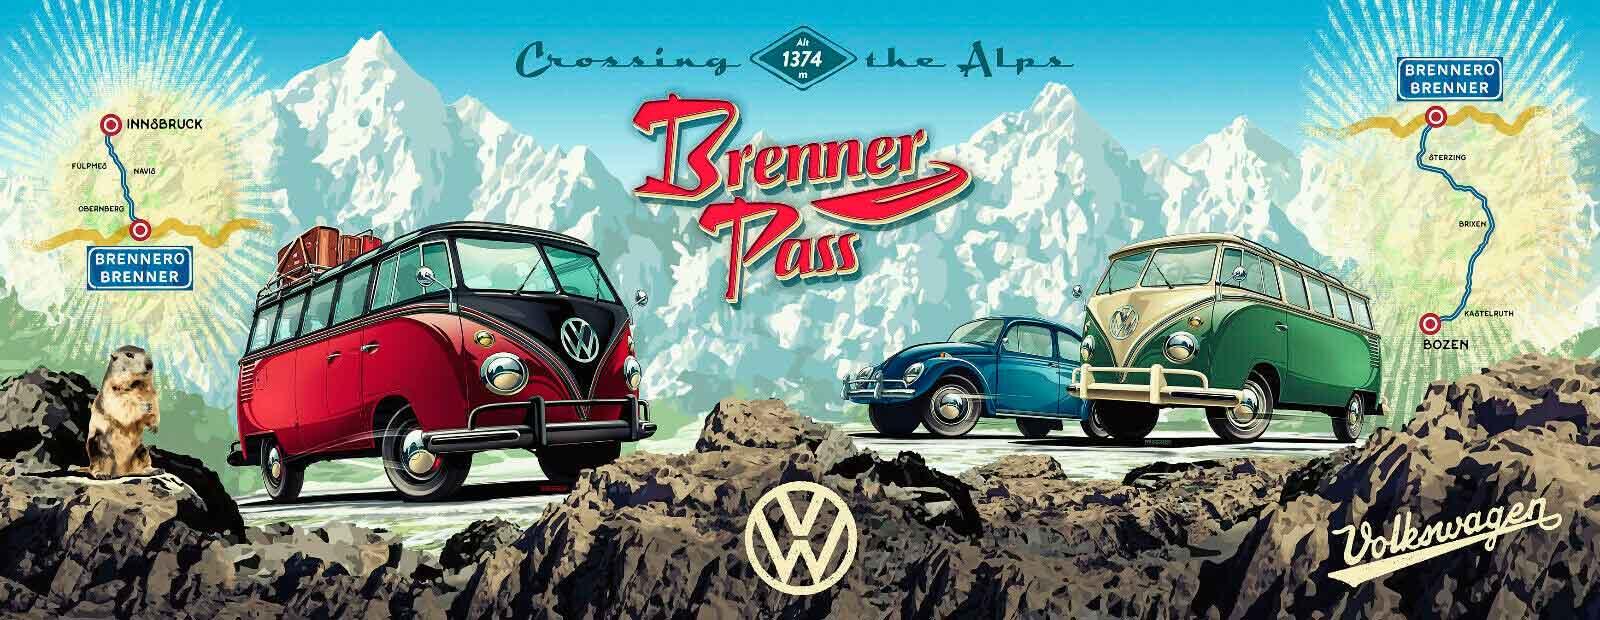 Puzzle Ravensburger Panorama Camper VW de 1000 Piezas